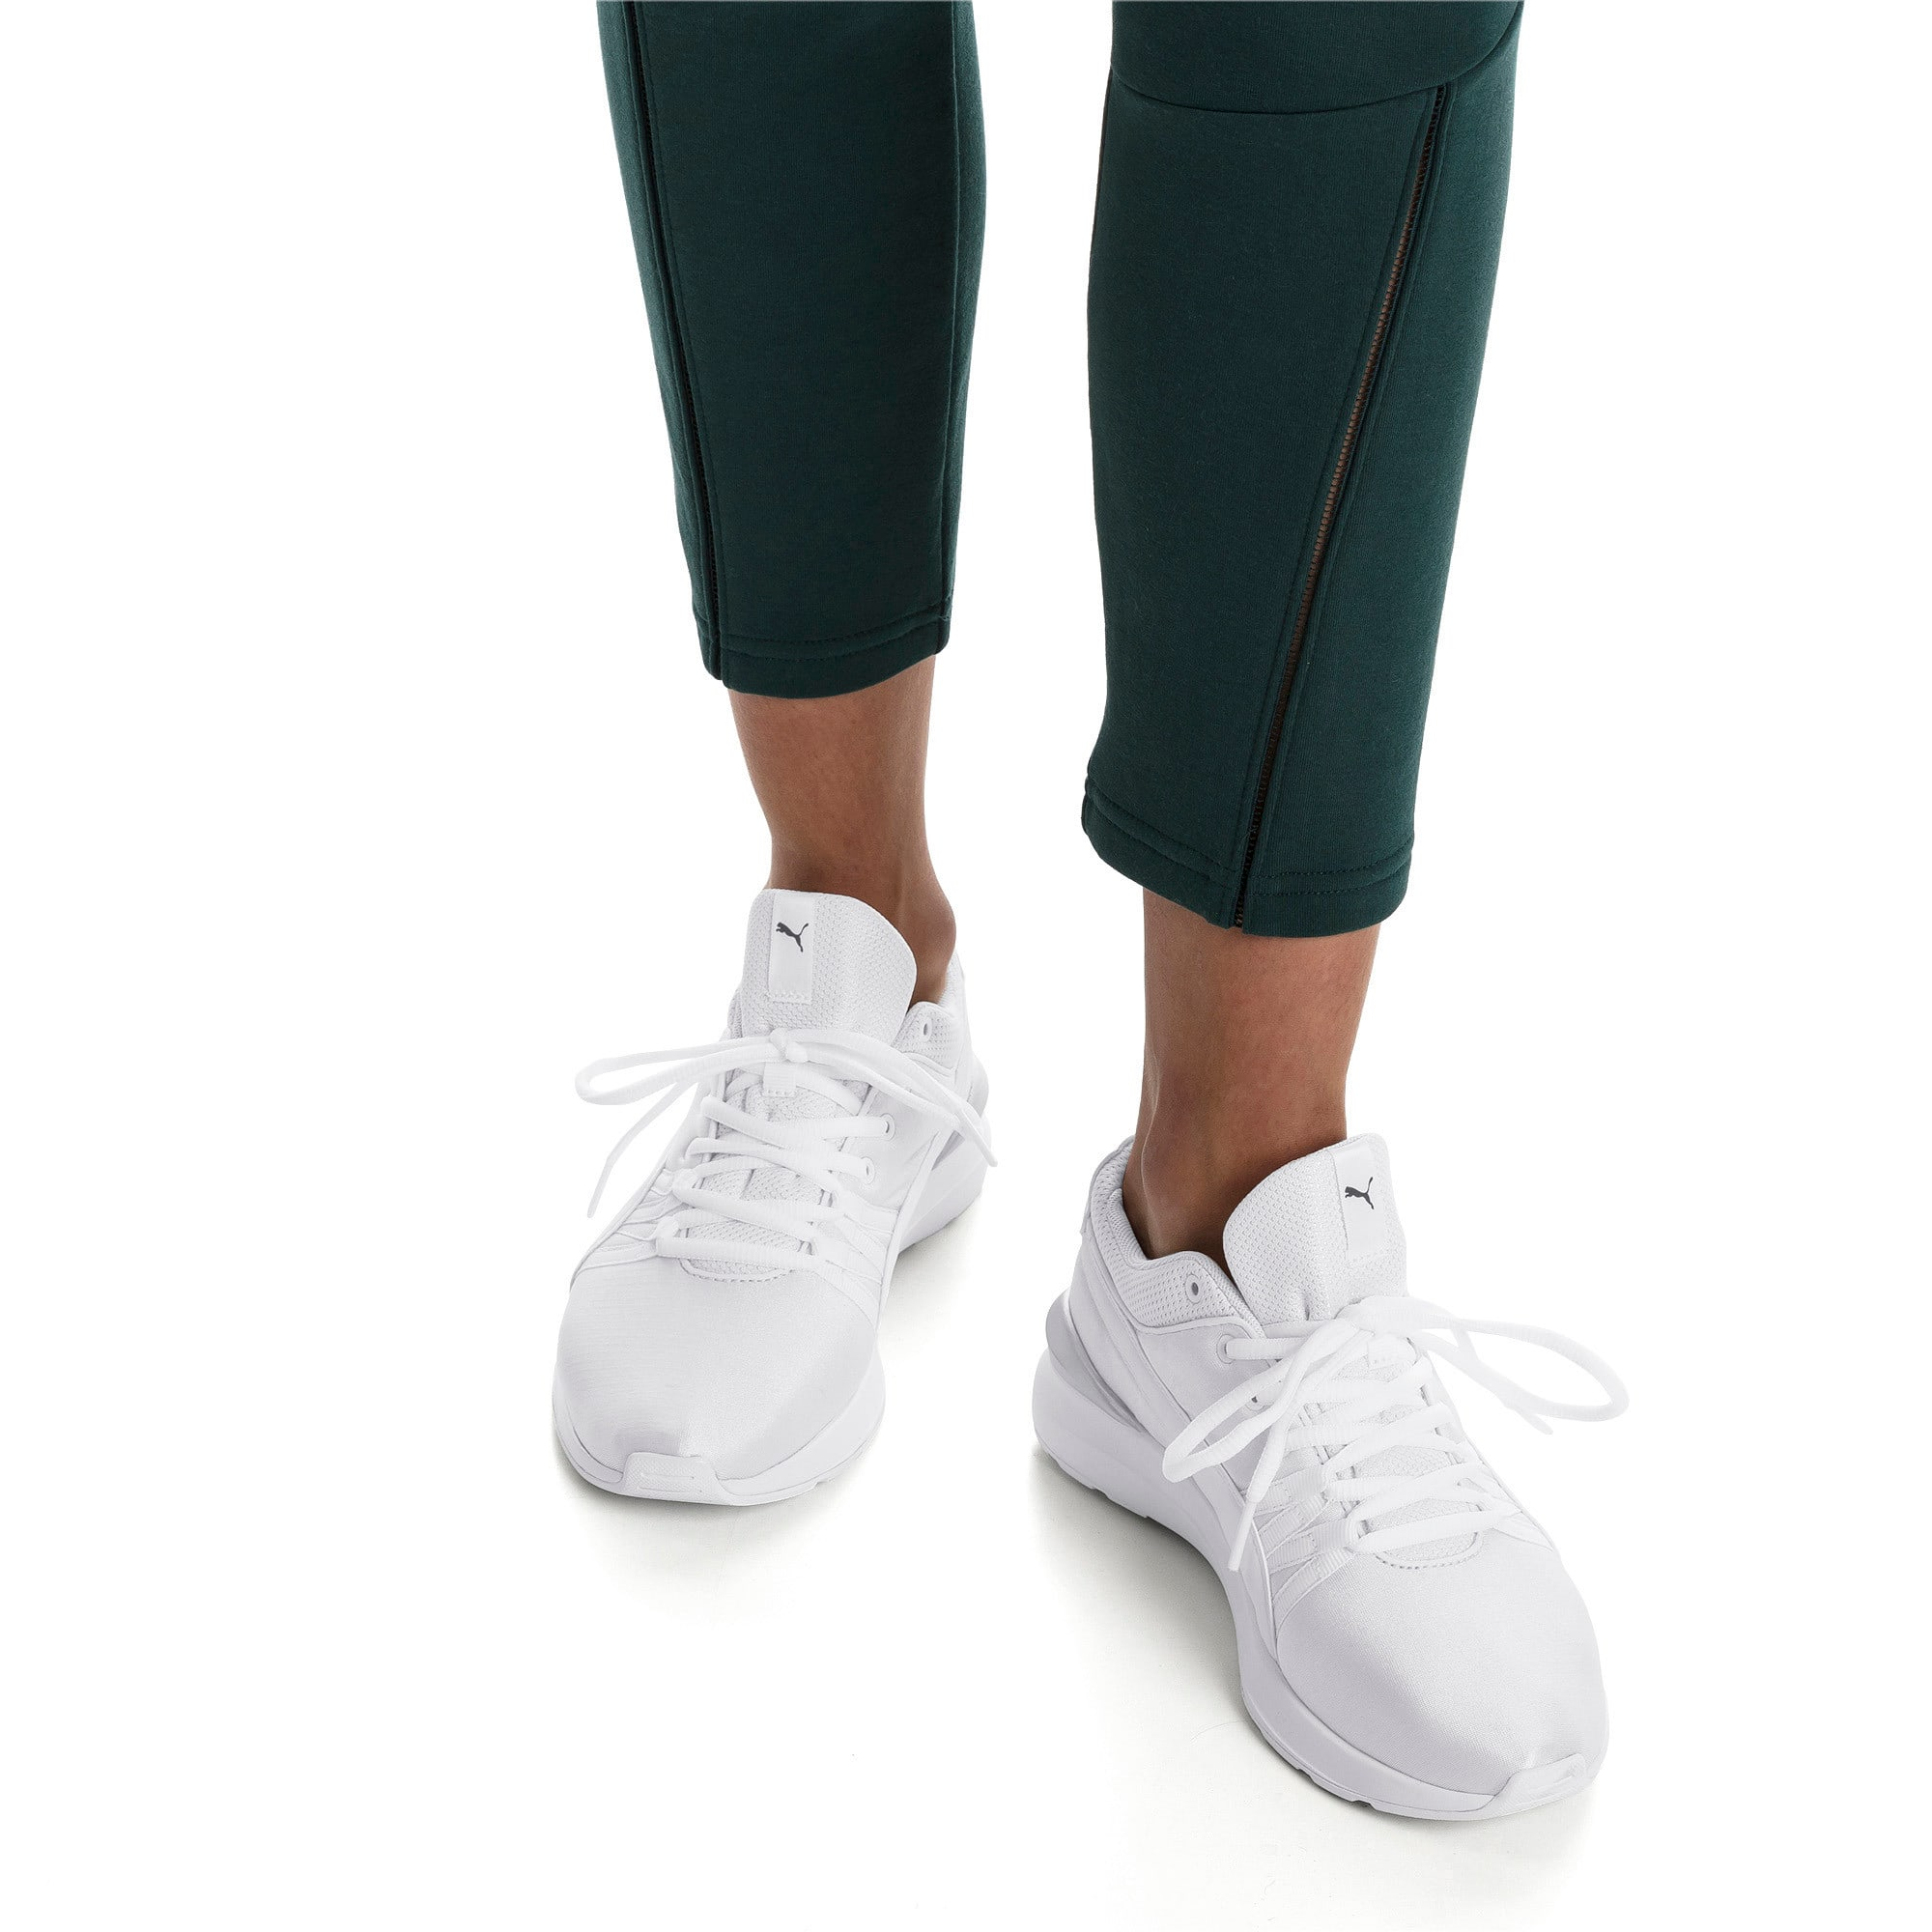 Thumbnail 8 of Adela Women's Sneakers, Puma White-Puma White, medium